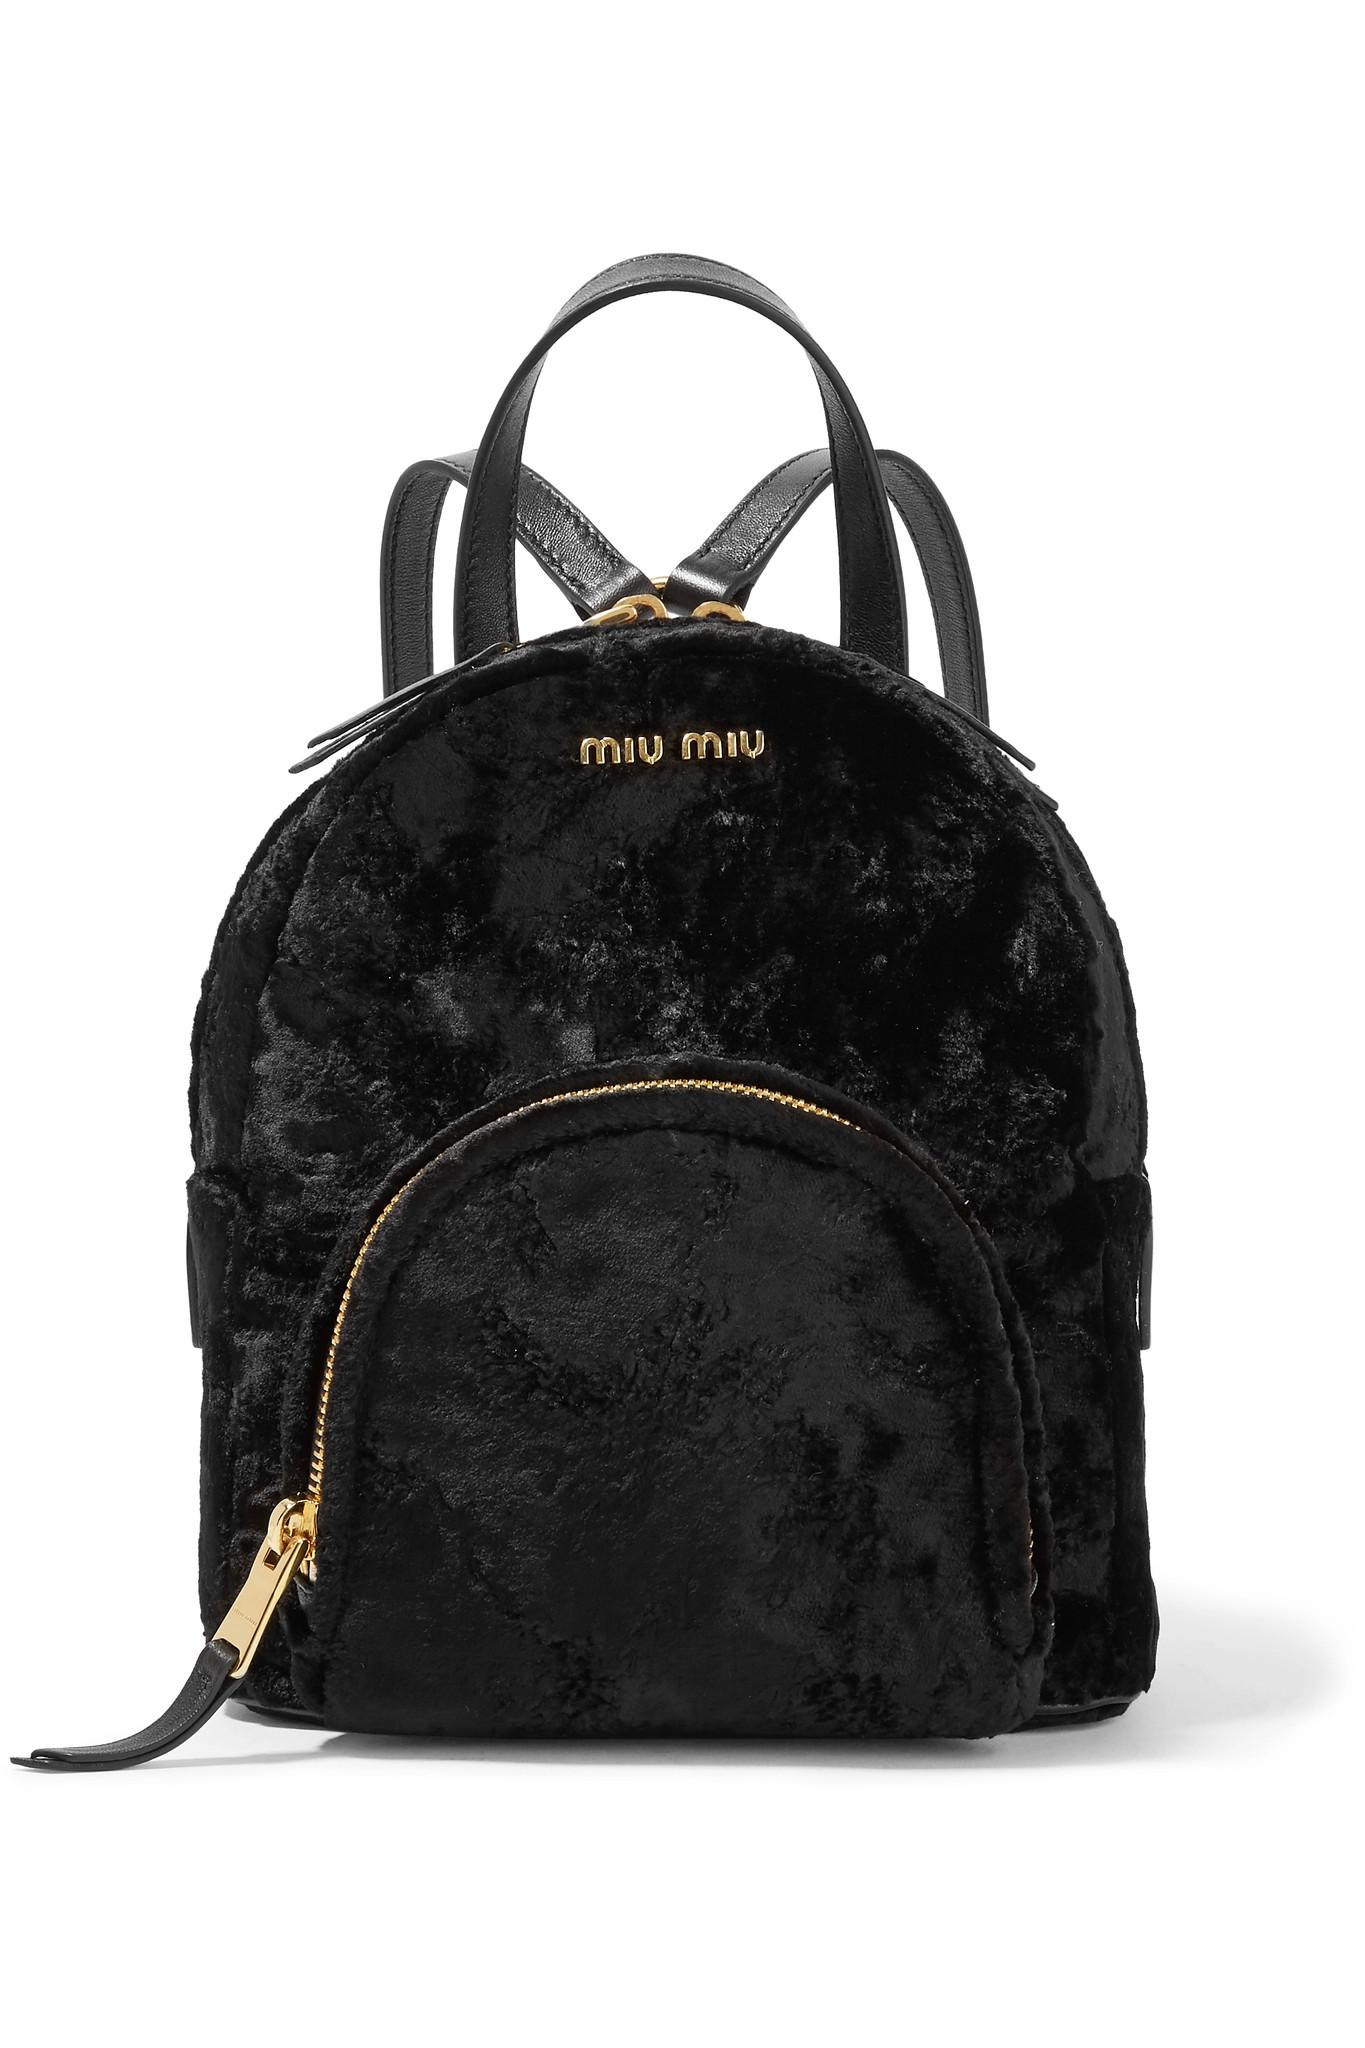 Miu Miu Leather-trimmed Velvet Backpack in Black - Lyst cec4b70ef7125